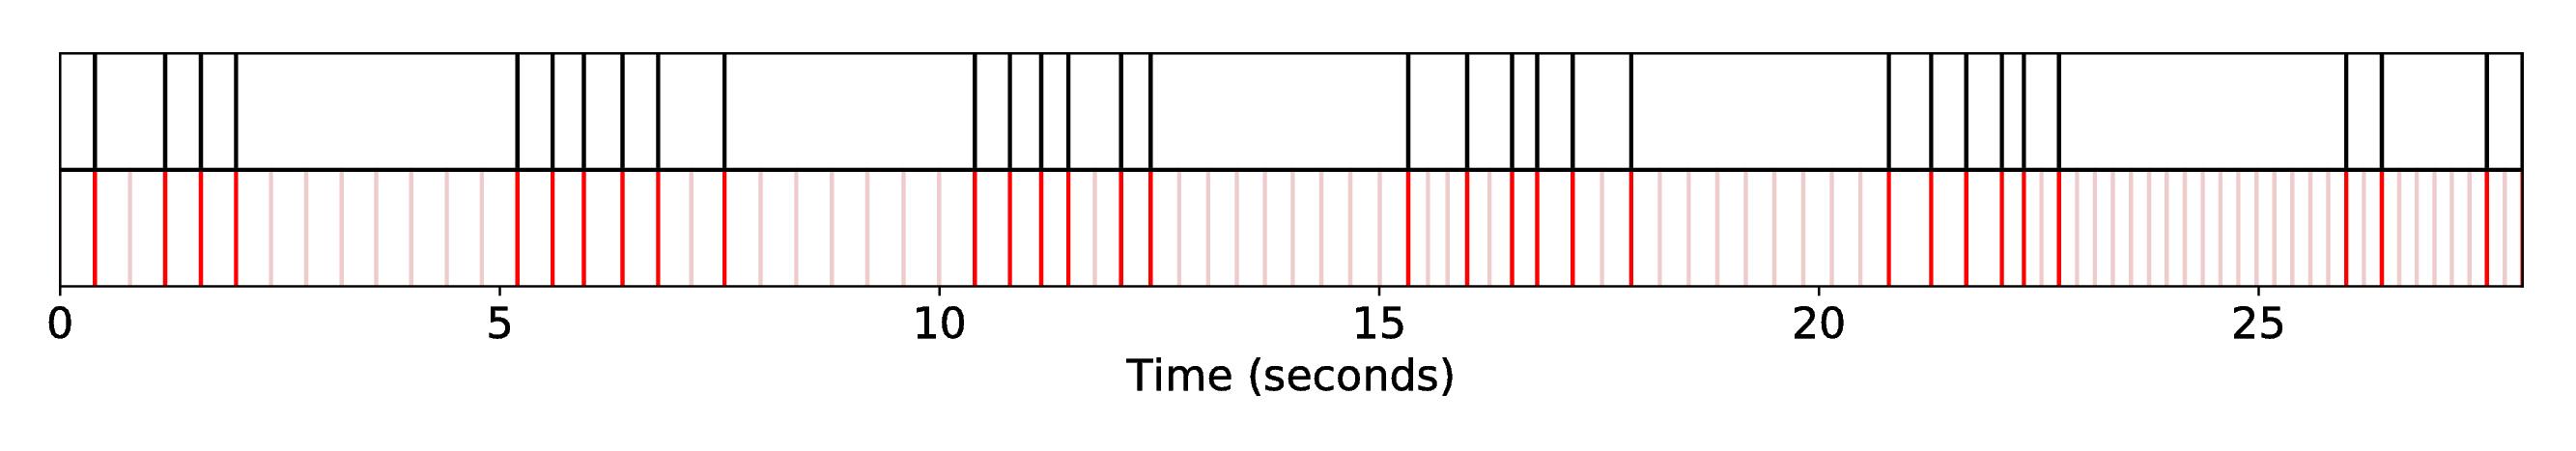 DP1_INT1_R-Syn-CoIrGa__S-Broke__SequenceAlignment